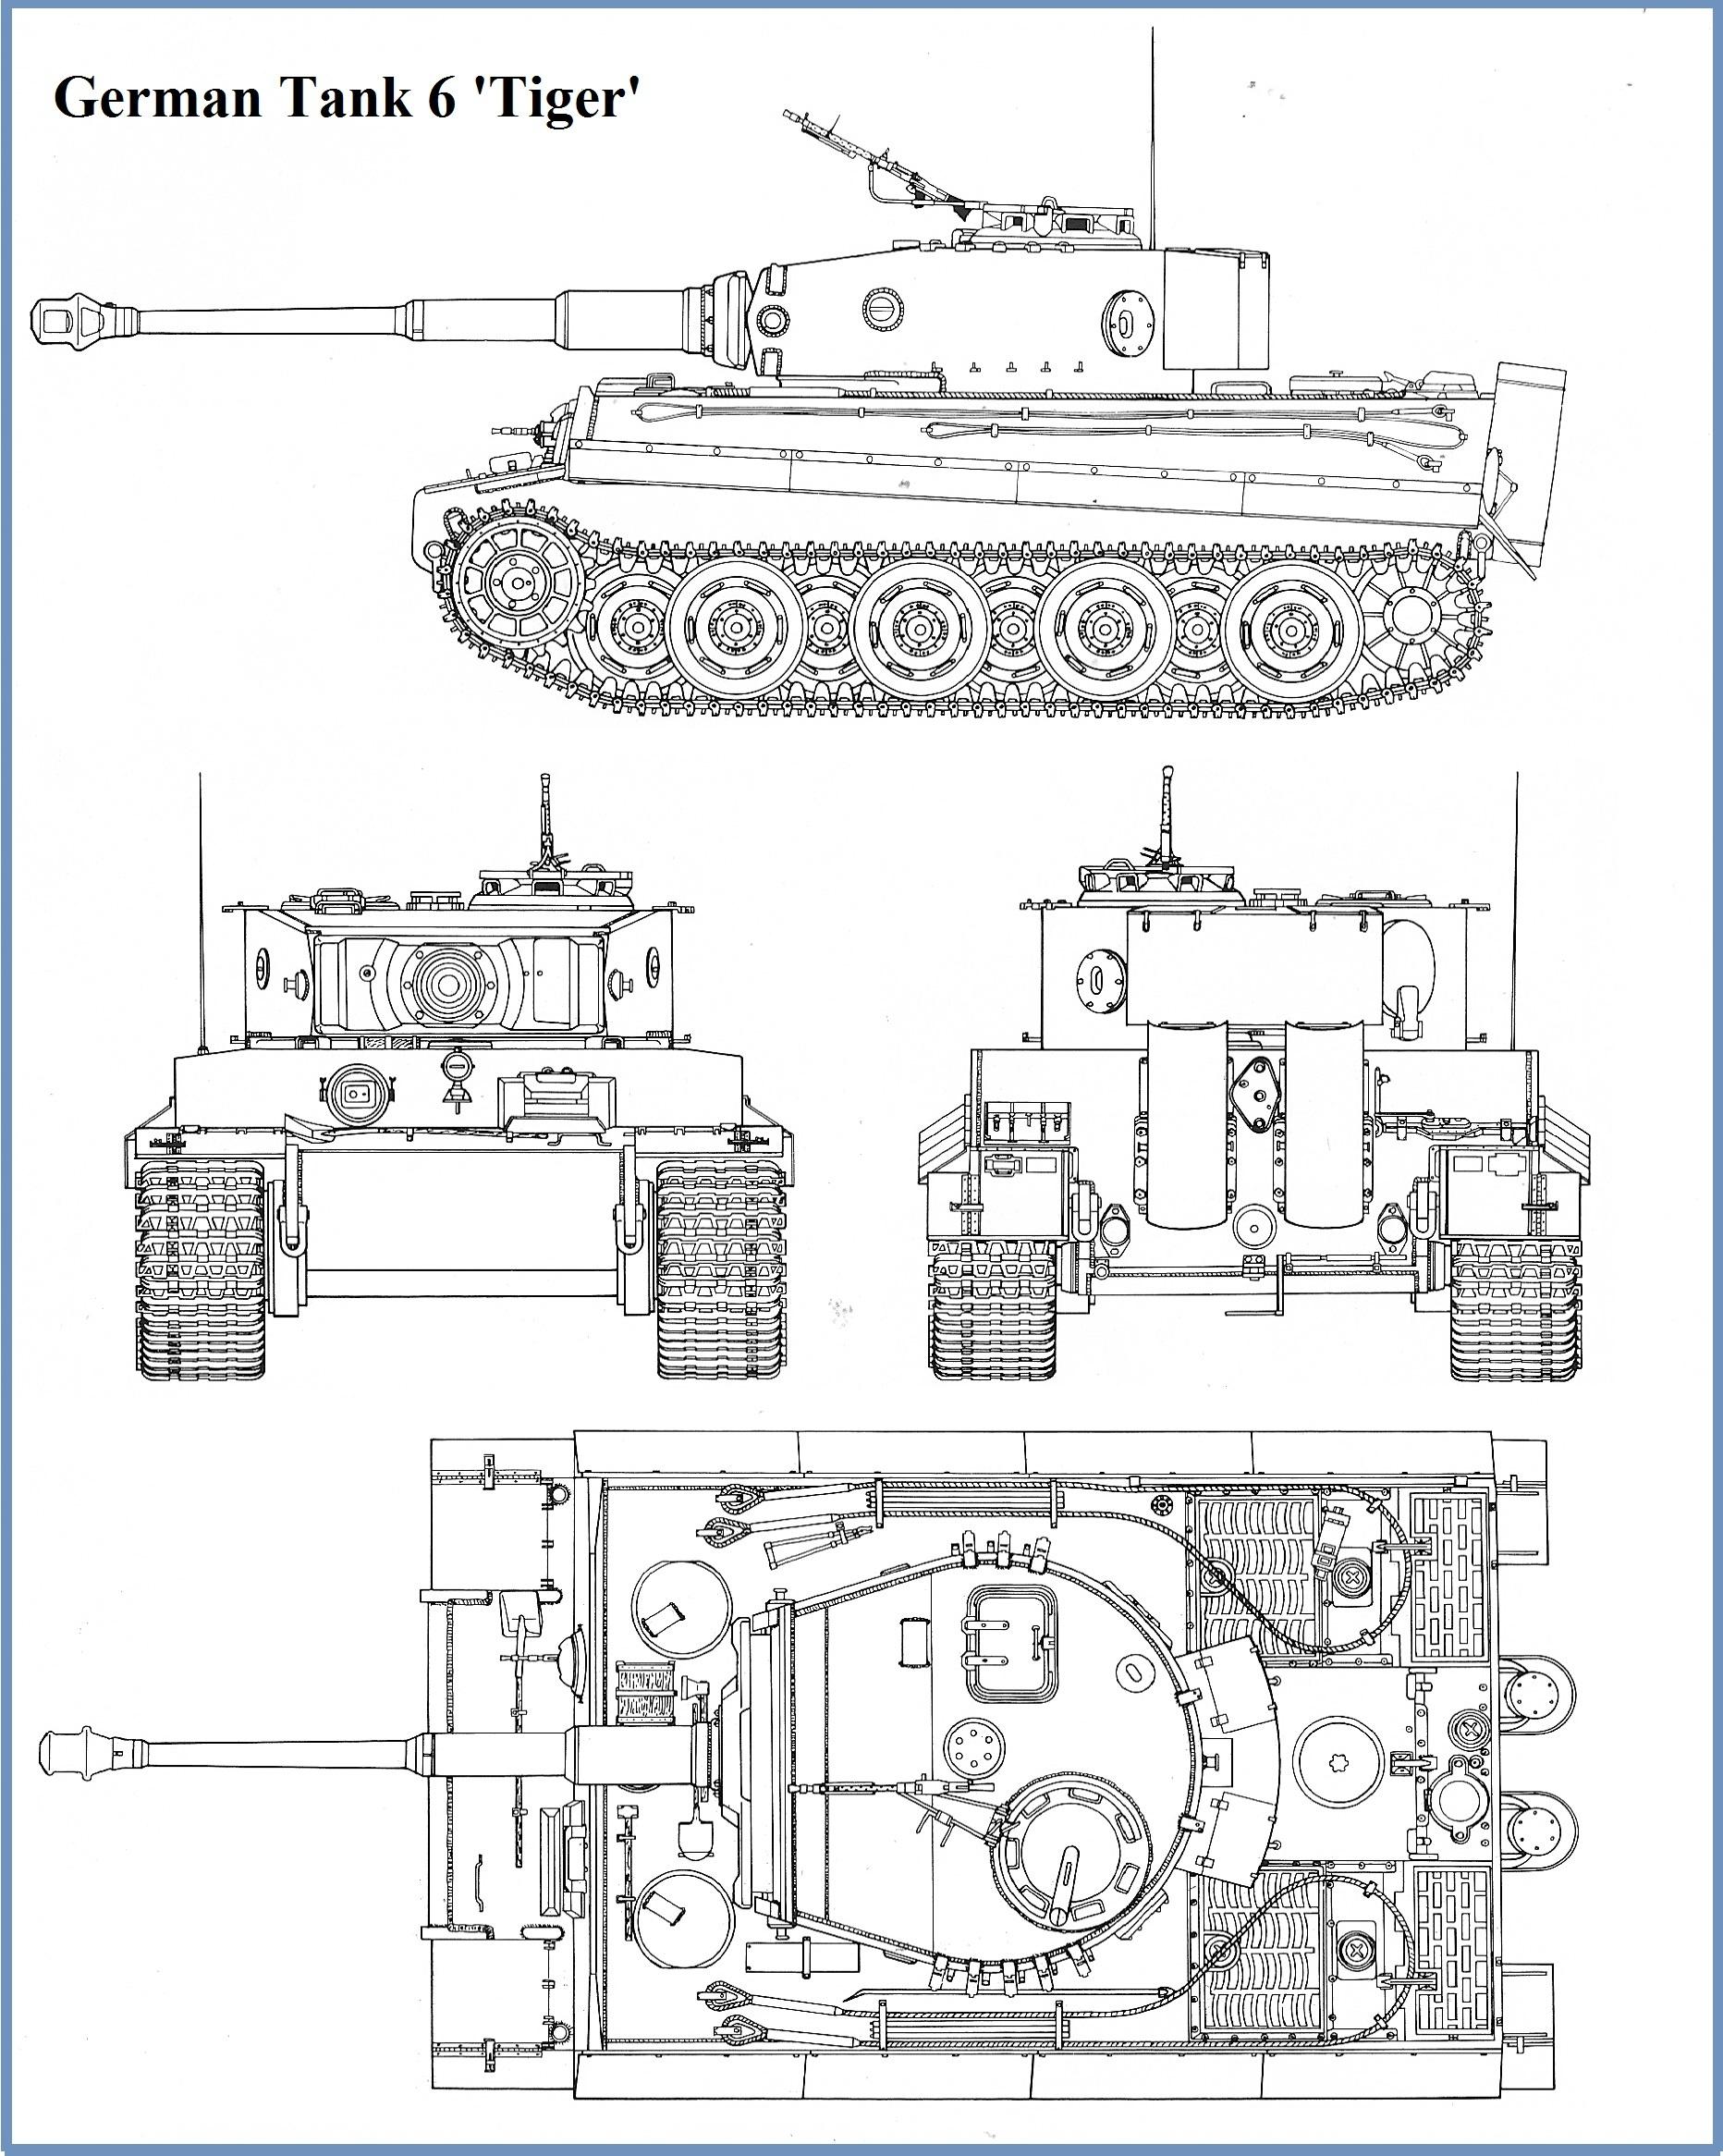 tiger tank diagram wiring diagrams Tiger 2 Tank Wallpaper was the king tiger tank an effective tank in ww2 quora rh quora com leapoard tank